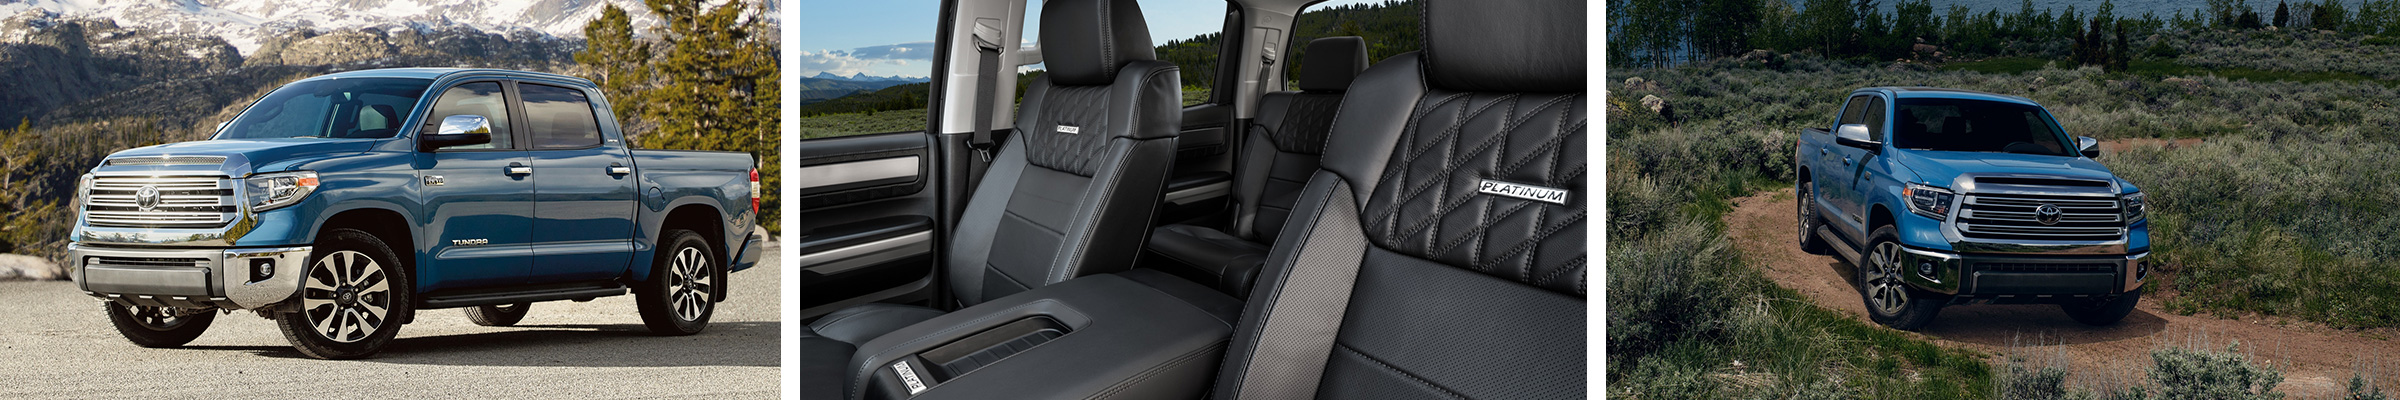 2021 Toyota Tundra For Sale Savannah GA | Chatham County